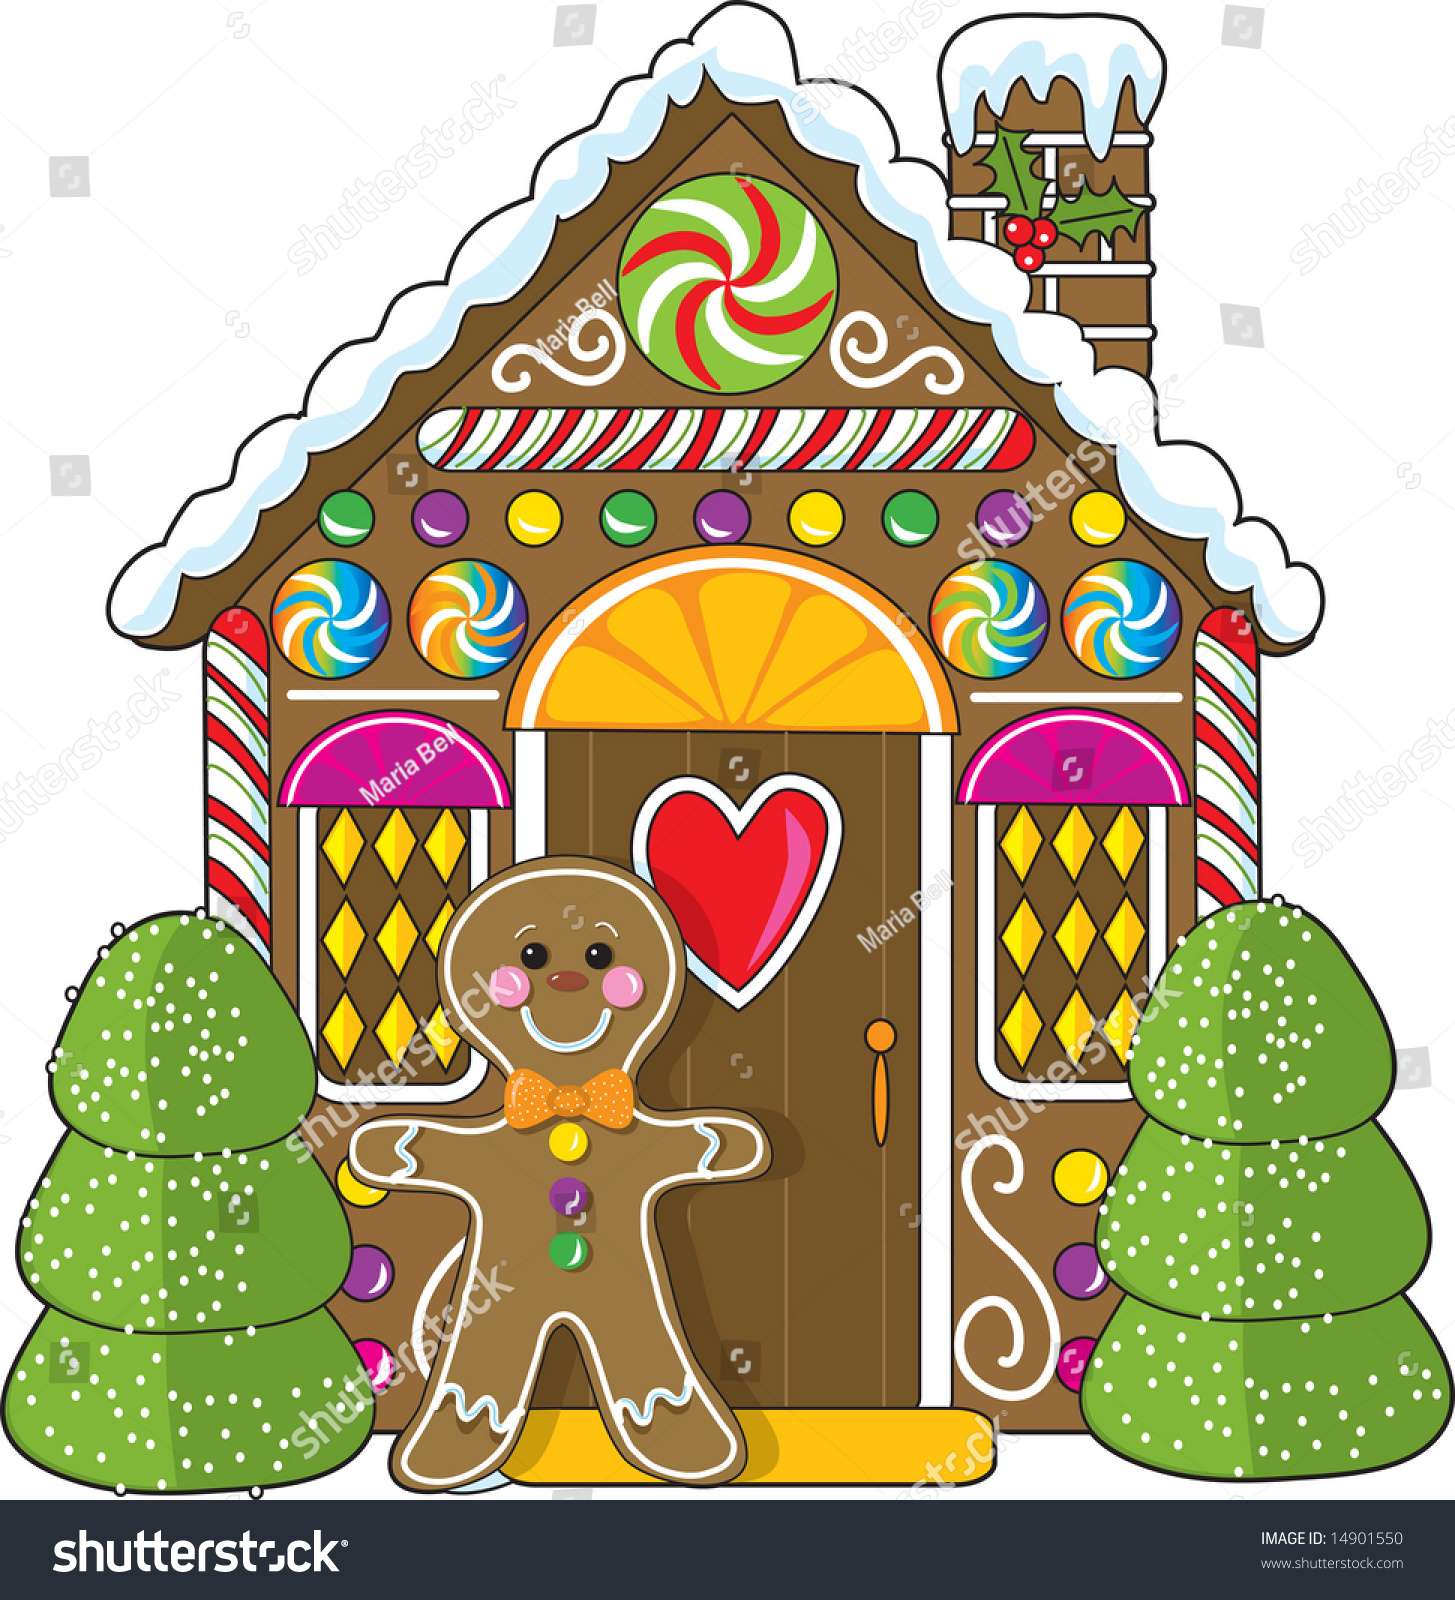 the little gingerbread man pdf